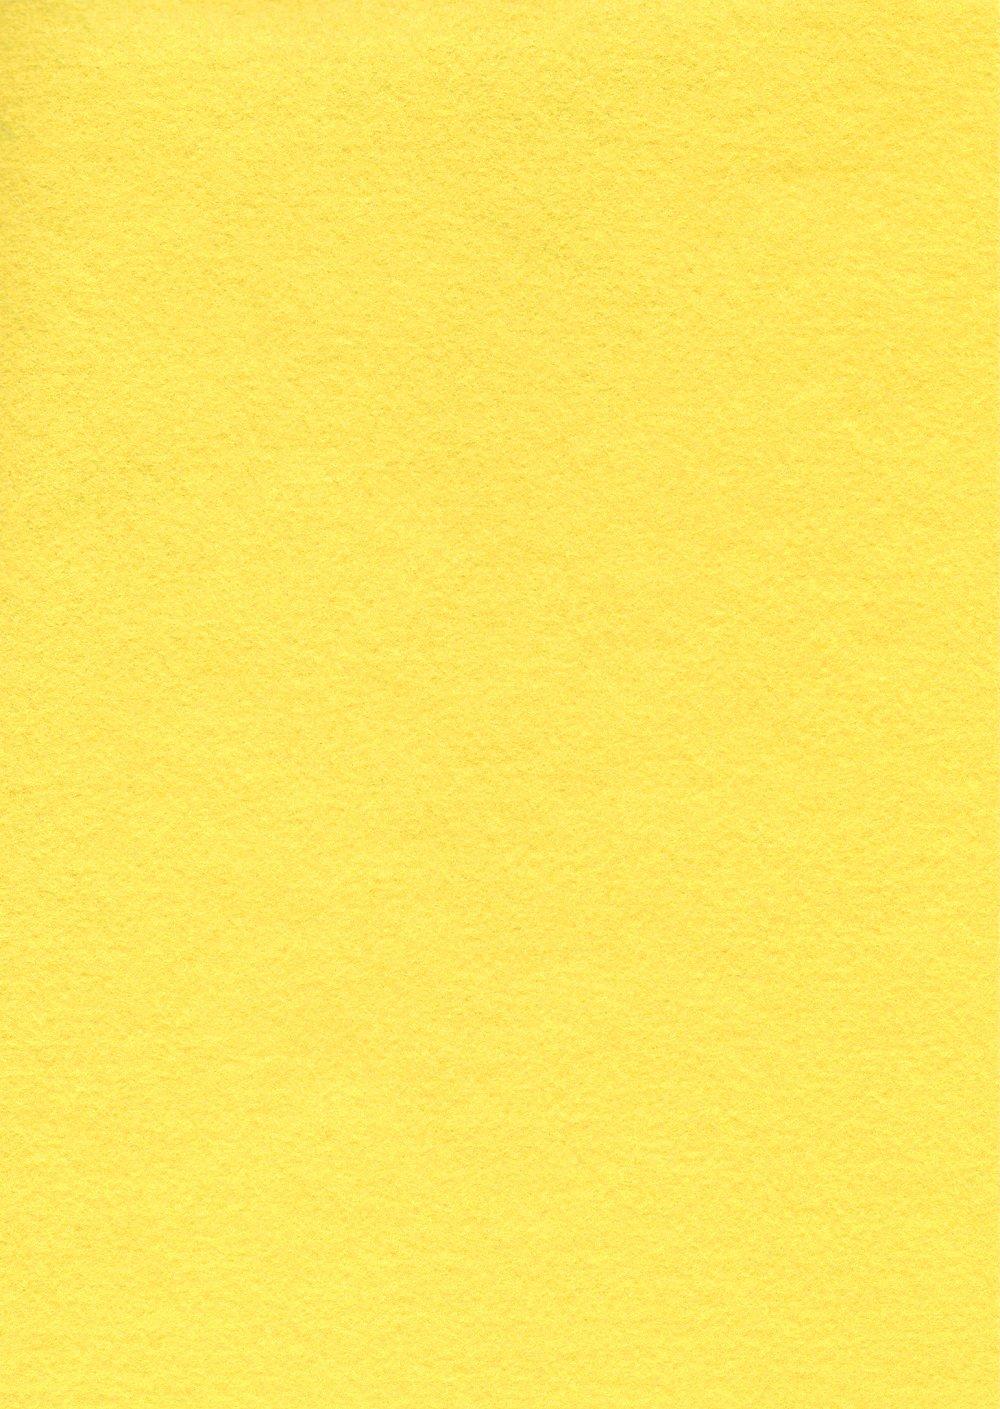 Banana Cream-12 x 18 Square